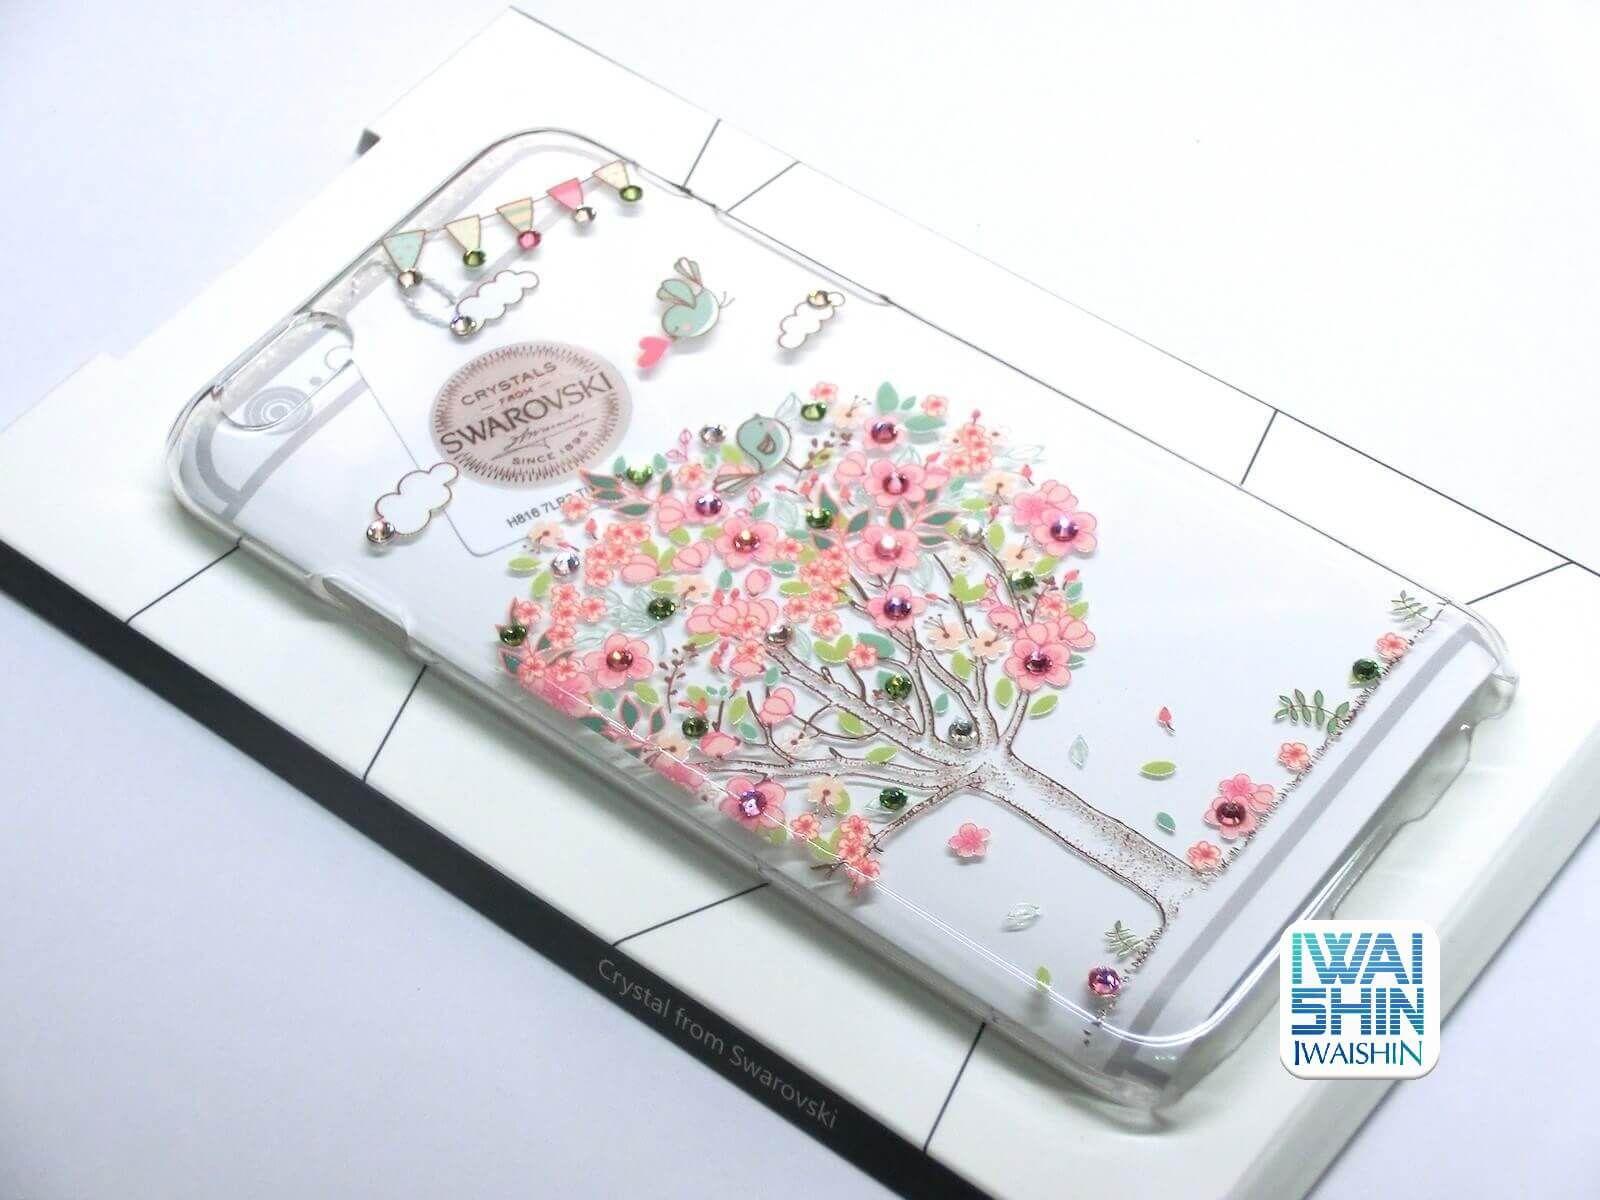 APBS 施華洛世奇 IPhone 6 保護殼5735